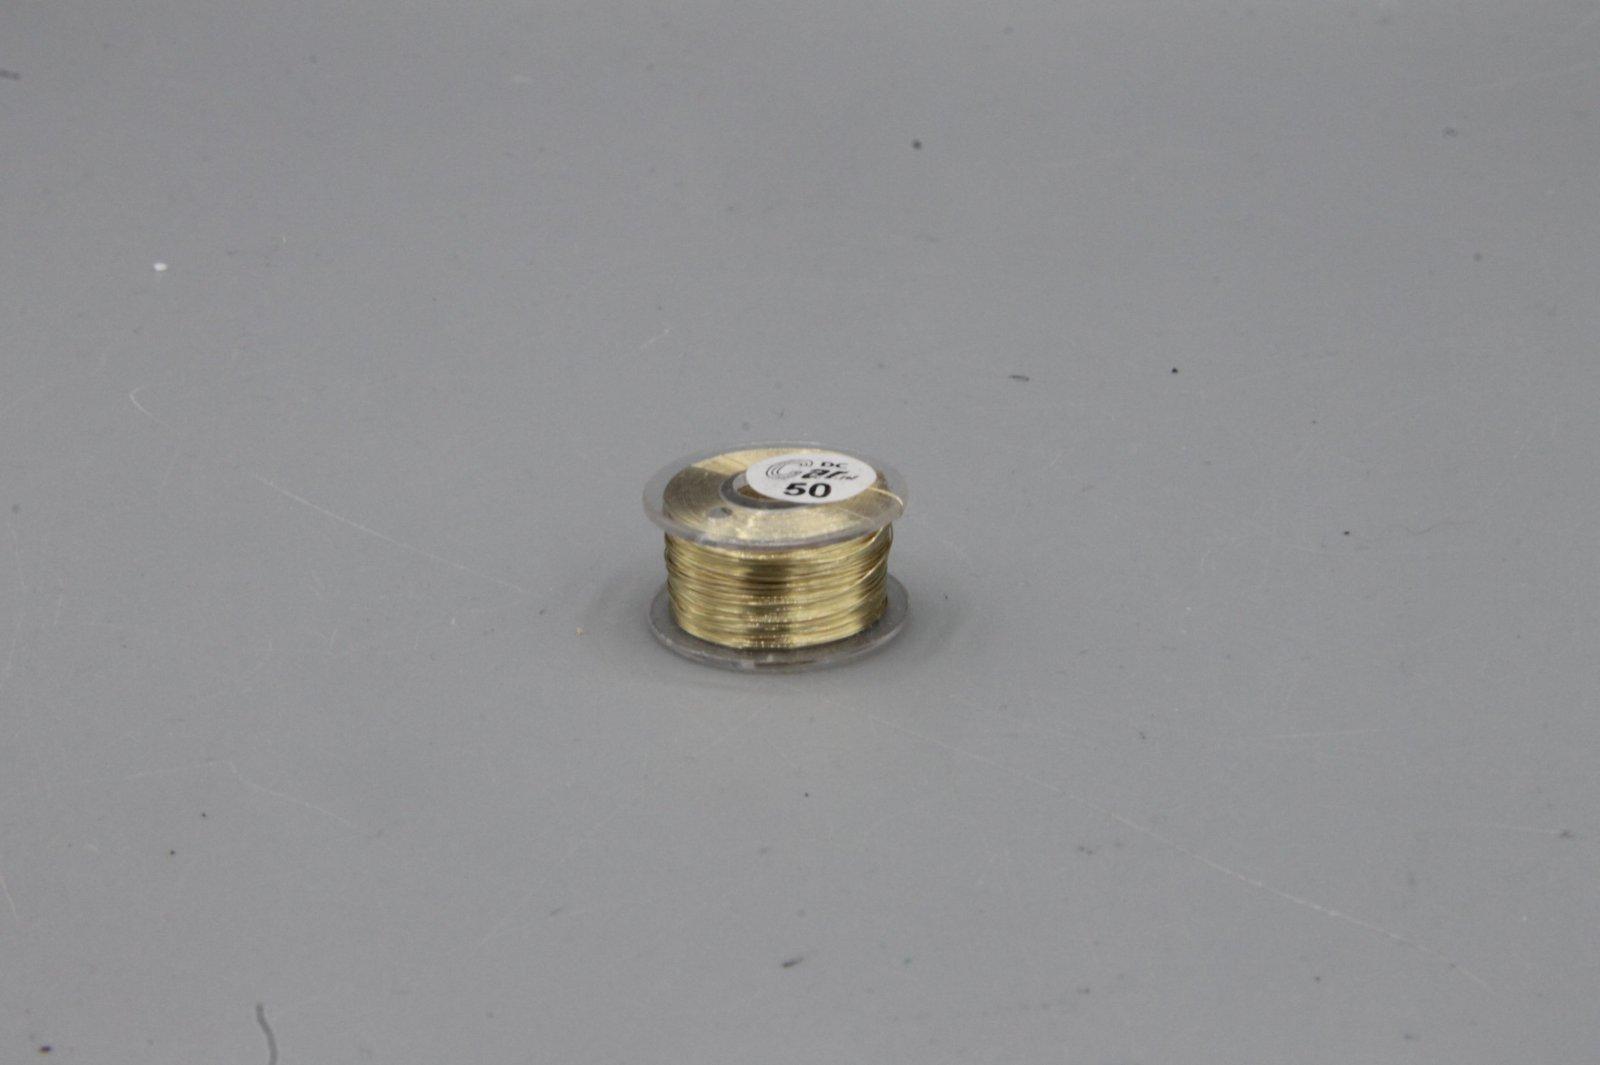 50 m Kupferlackdraht  gold 0,15 mm Lackdraht Cu-Draht auf 50m-Spule